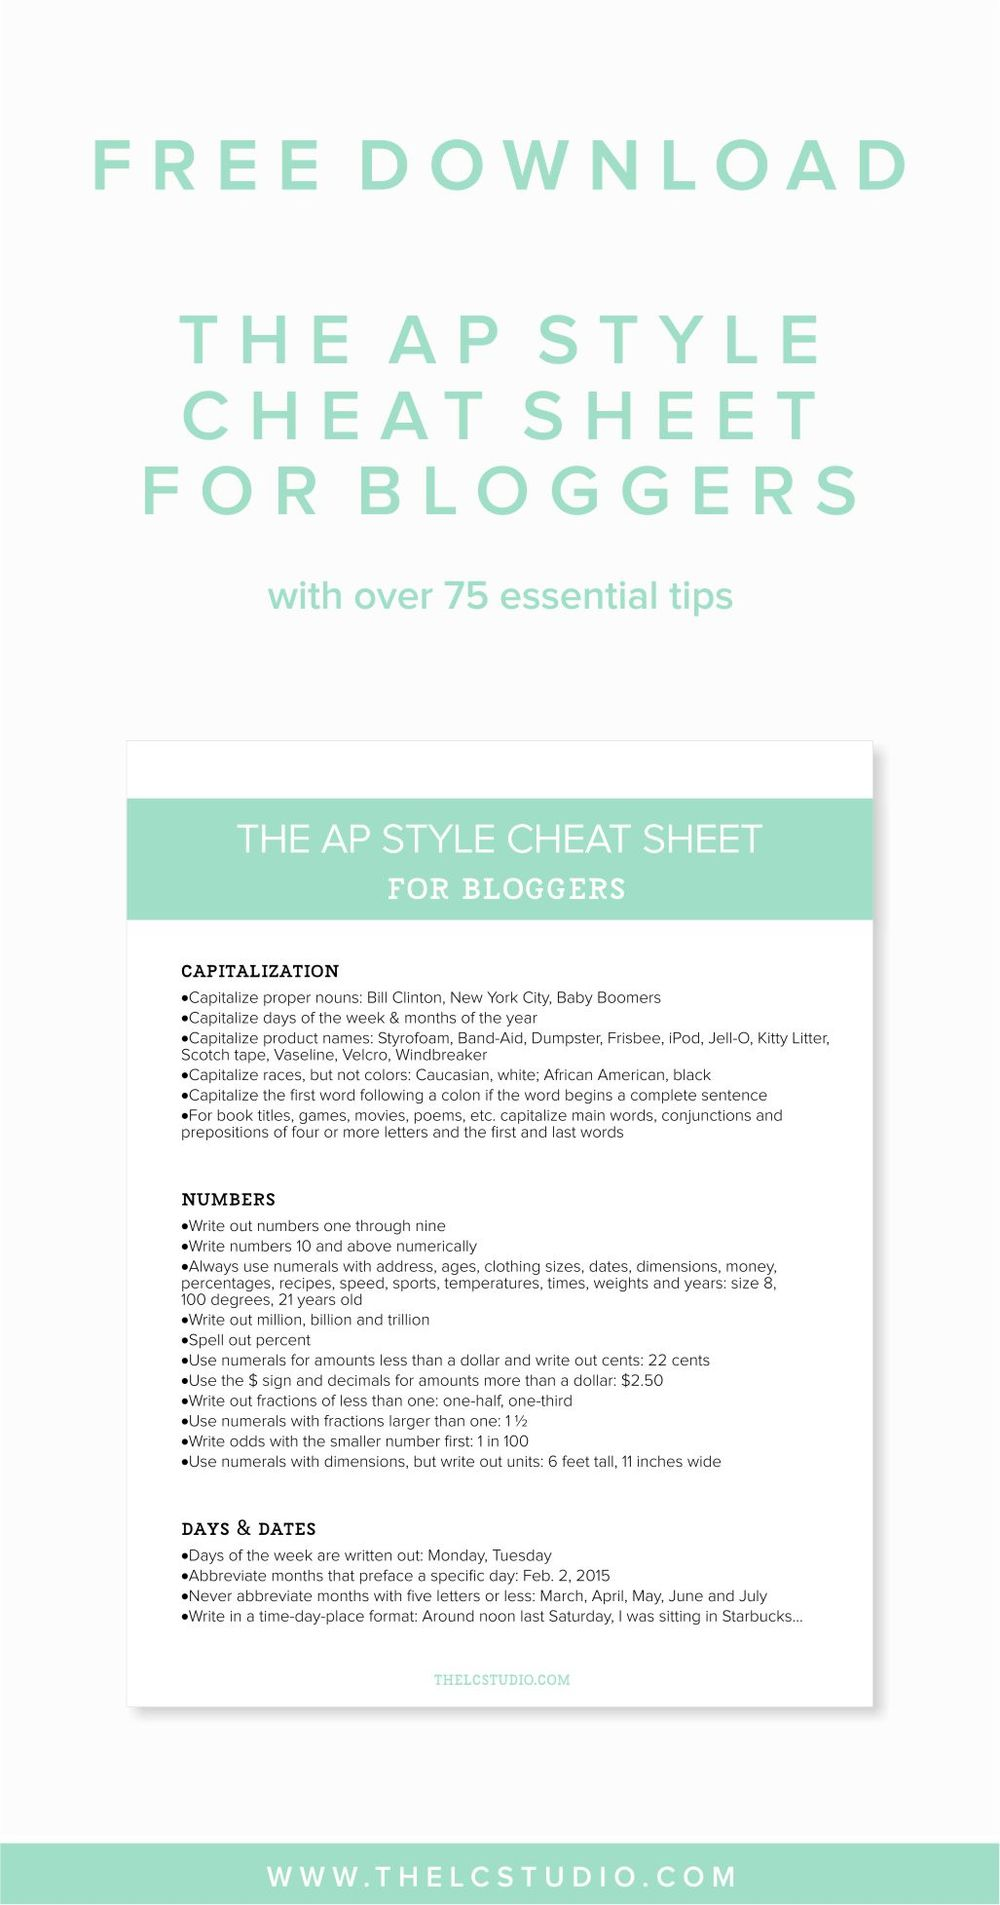 APStyleCheatSheetBloggers.png